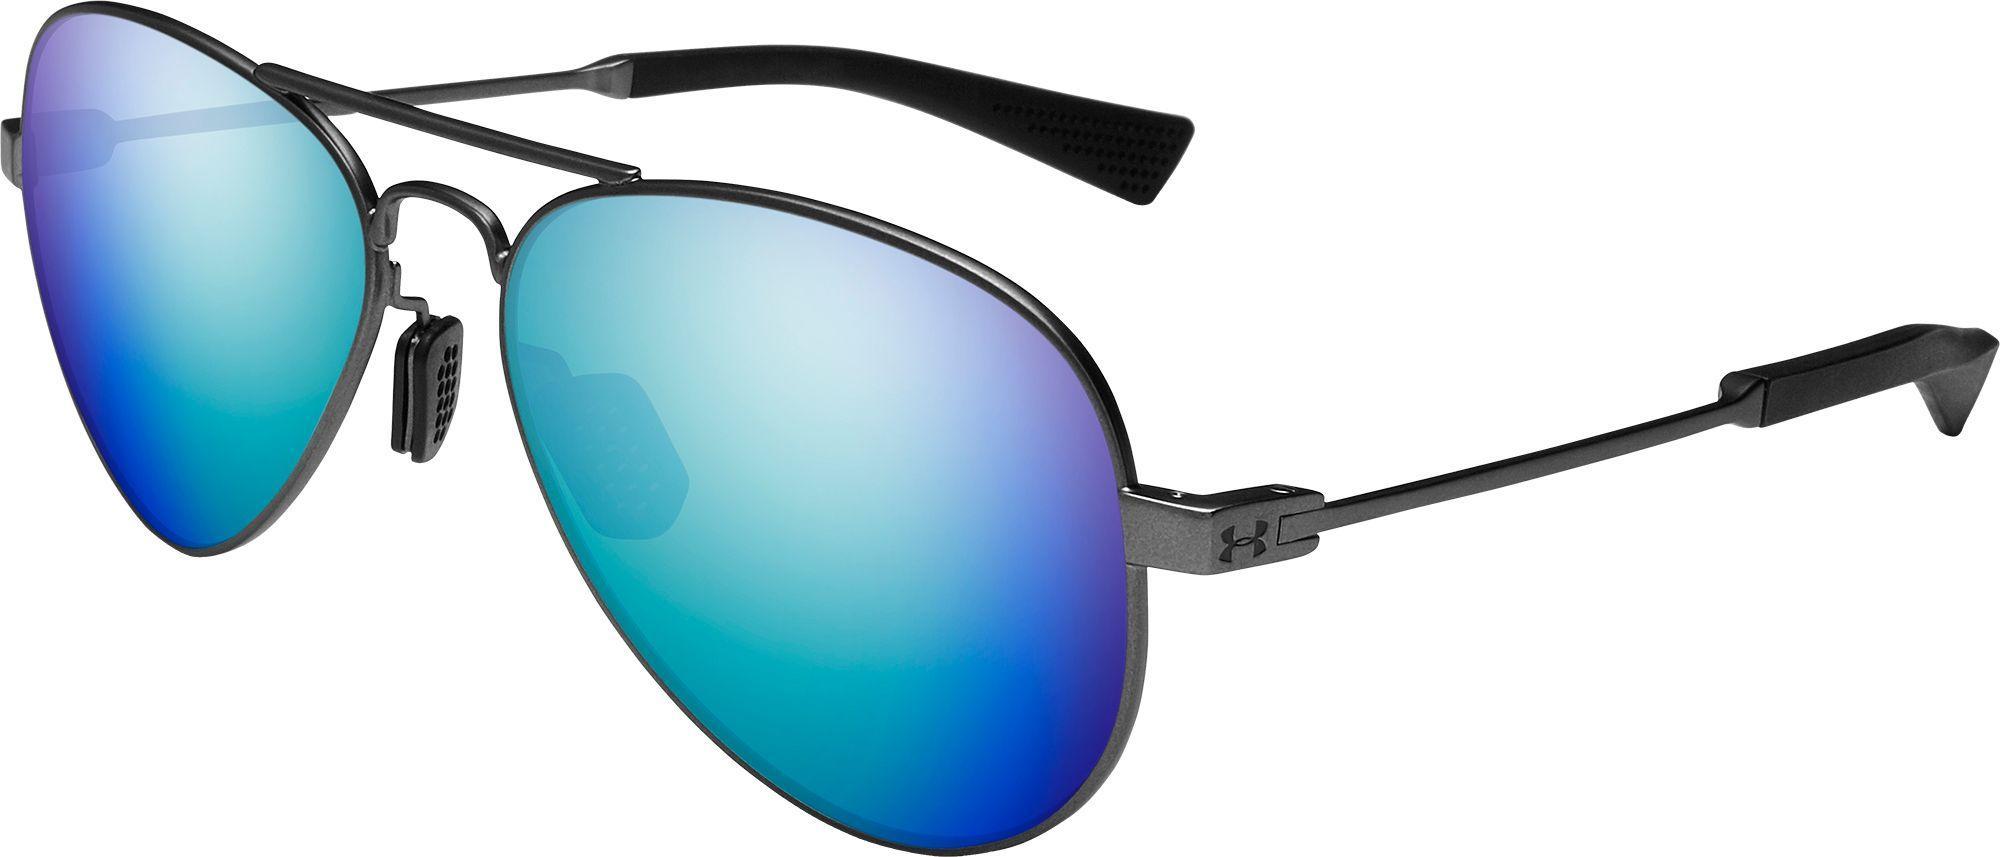 896473d2f3 Lyst - Under Armour Getaway Sunglasses for Men